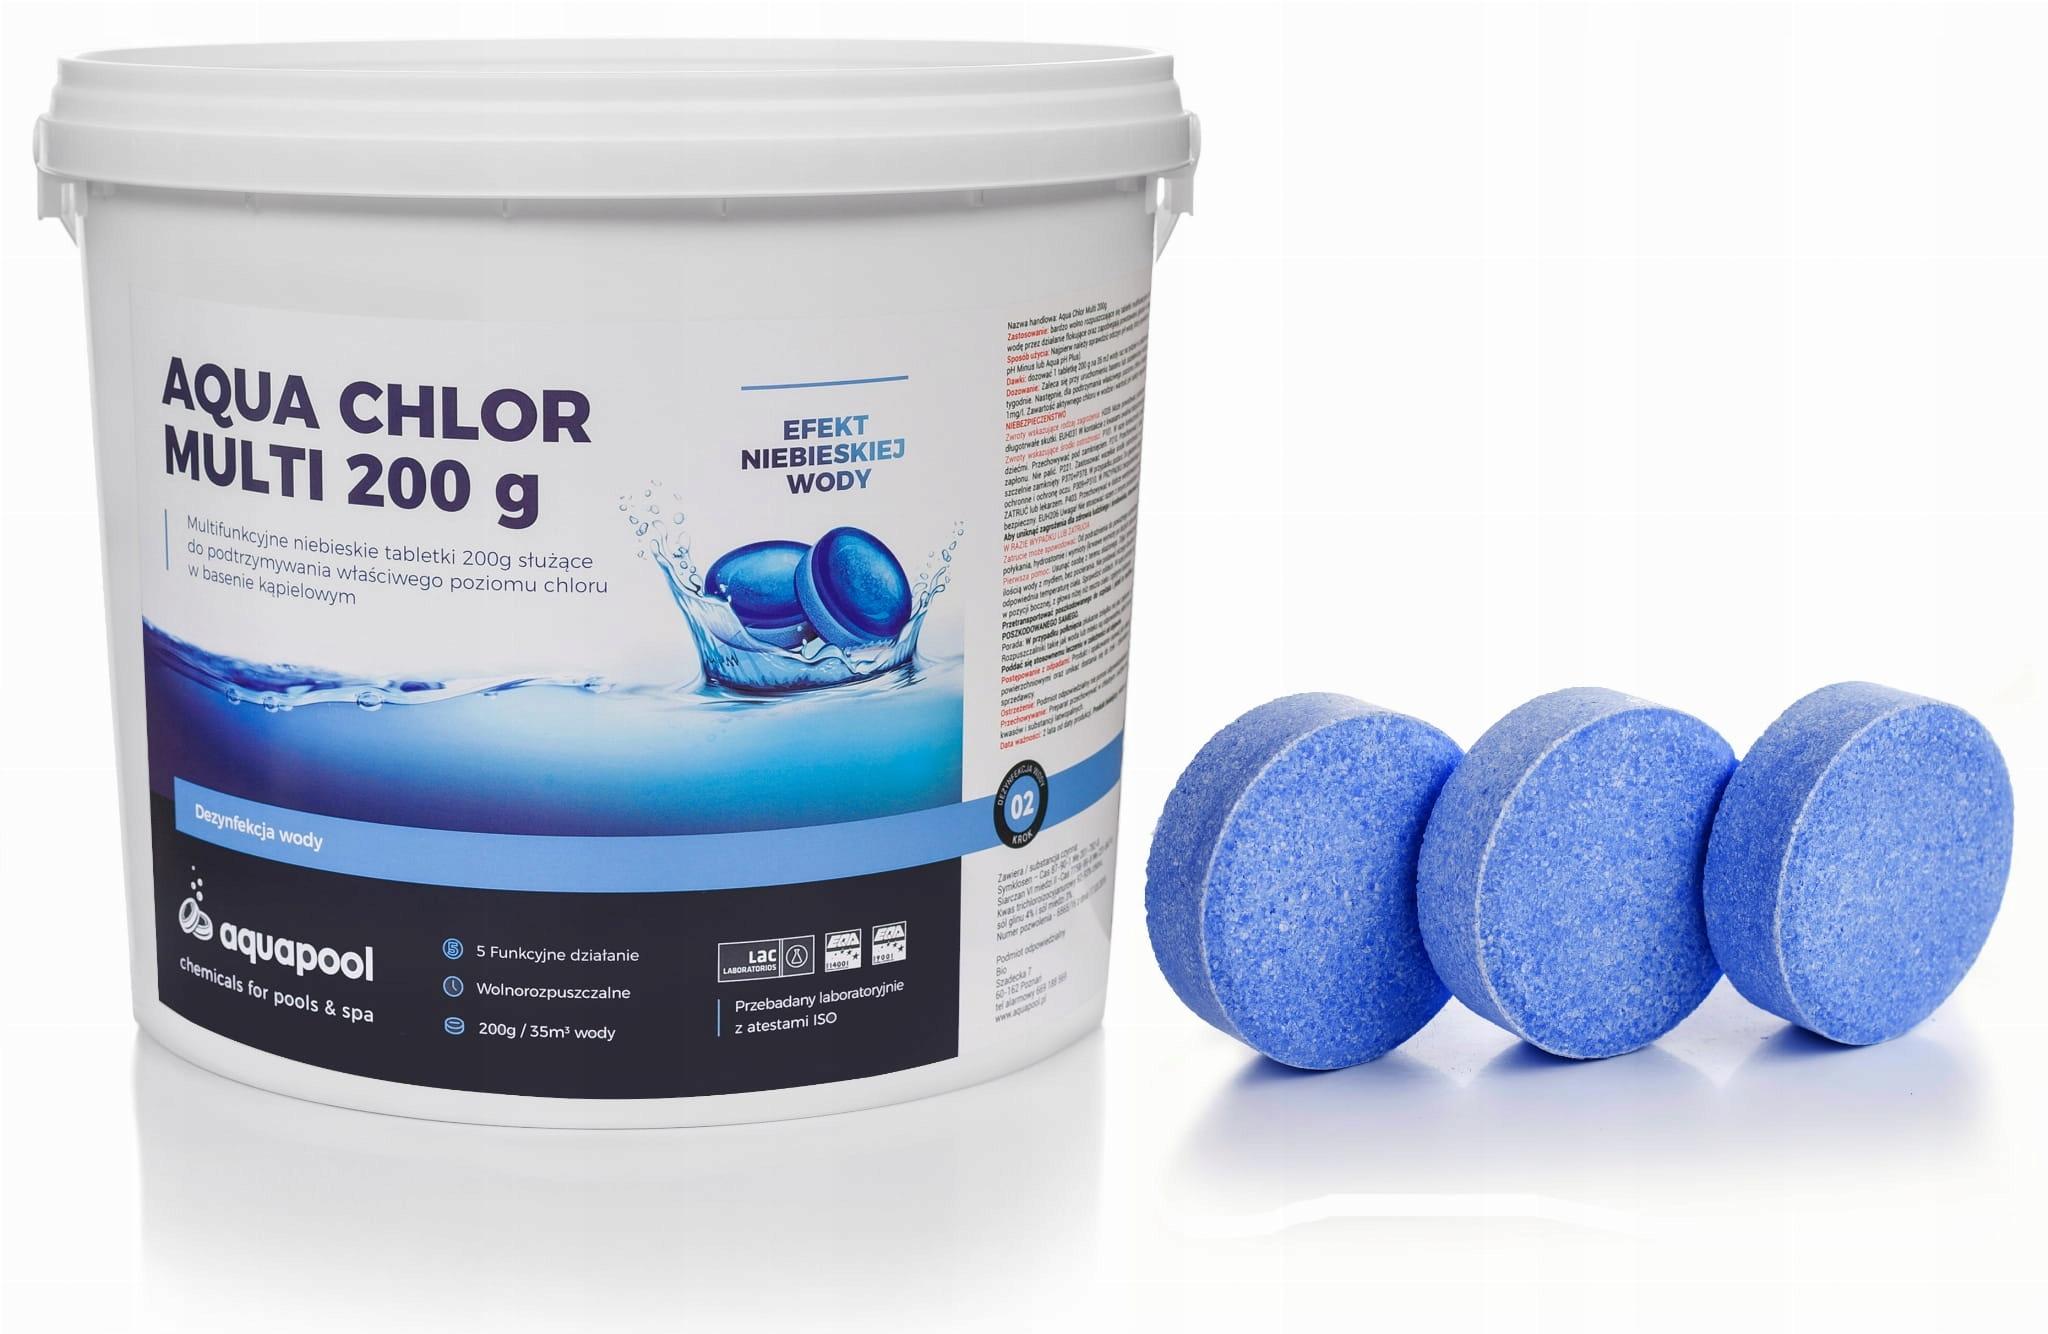 CHLOR TABLETKI BLUE 200g CHEMIA NIEBIESKA WODA 5kg